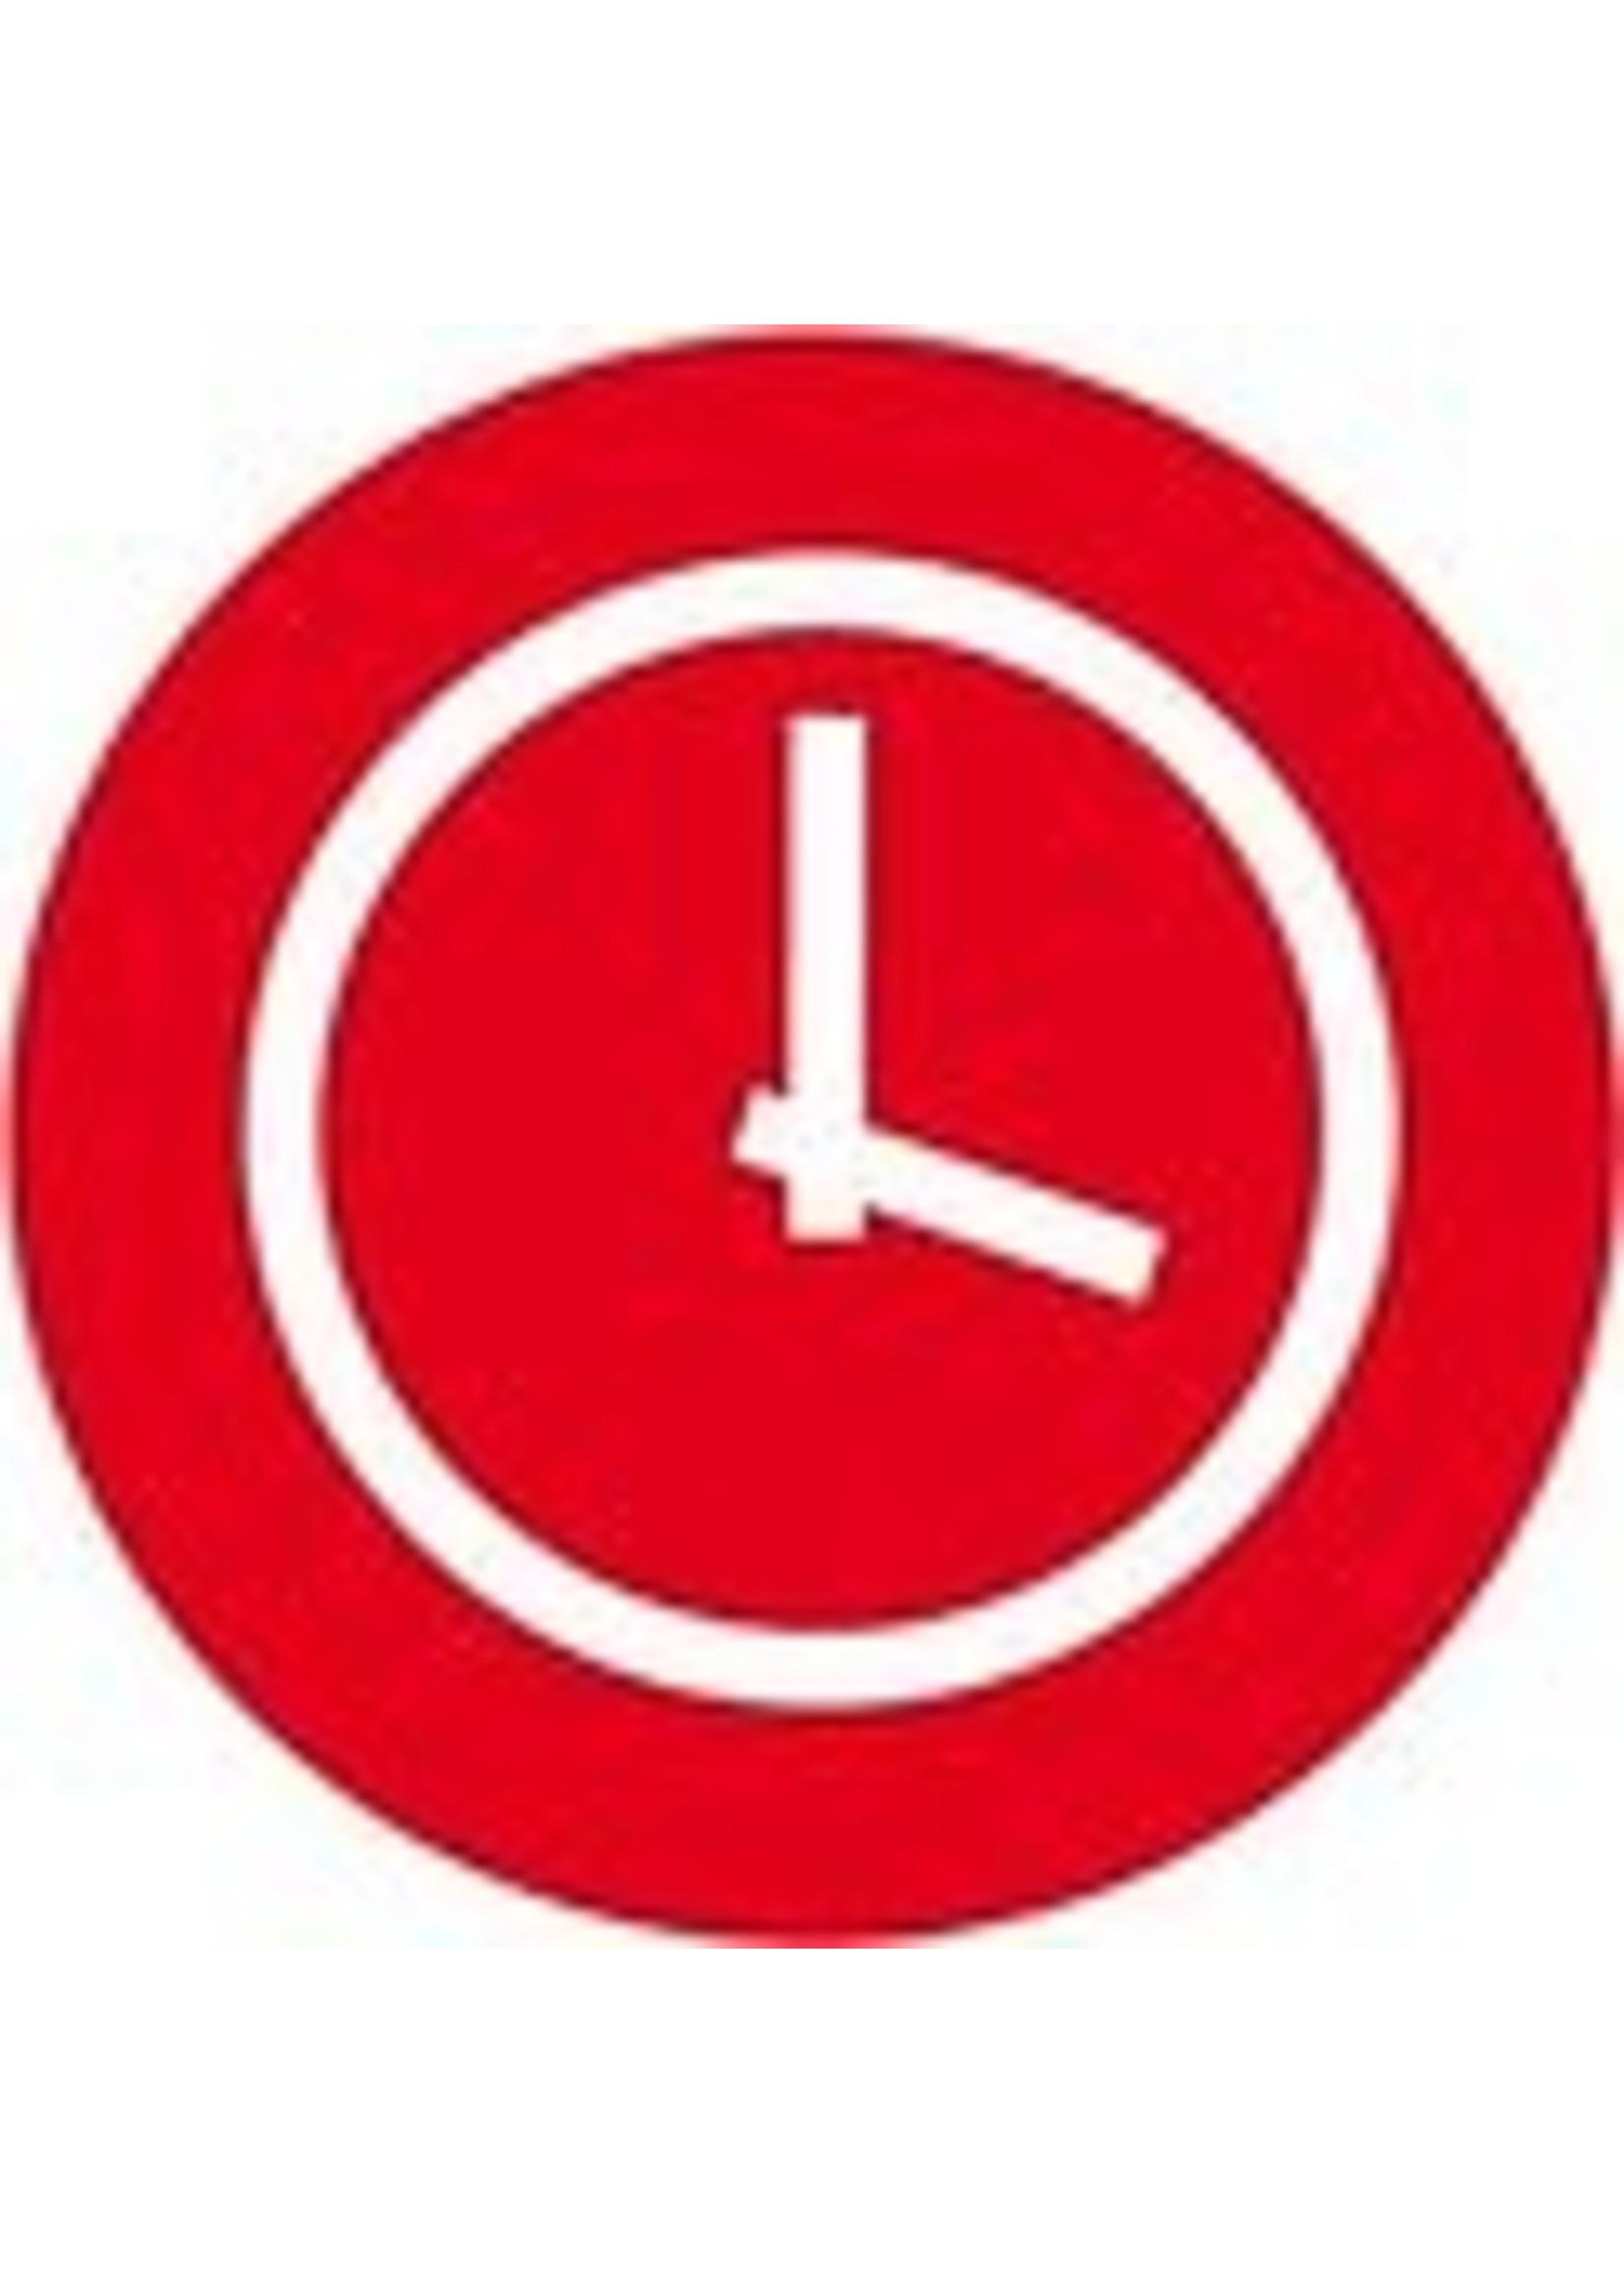 Brennenstuhl Brennenstuhl 1507500 Timer/power strip digital 7 day mode 3680 W IP20 Count-down mode, RND mode